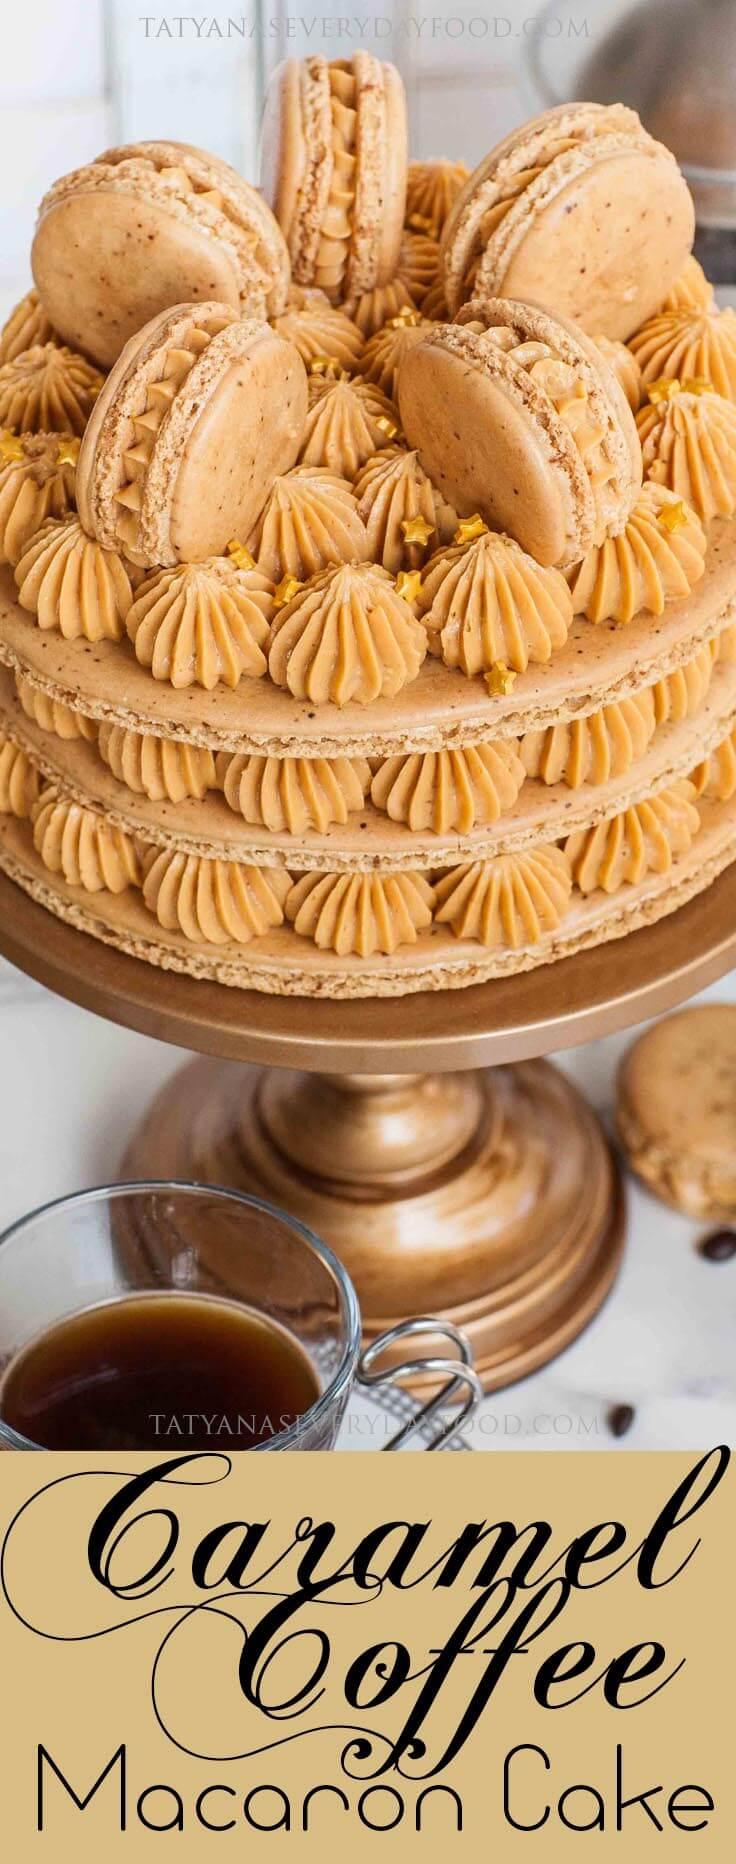 Caramel Coffee Macaron Cake Recipe with video